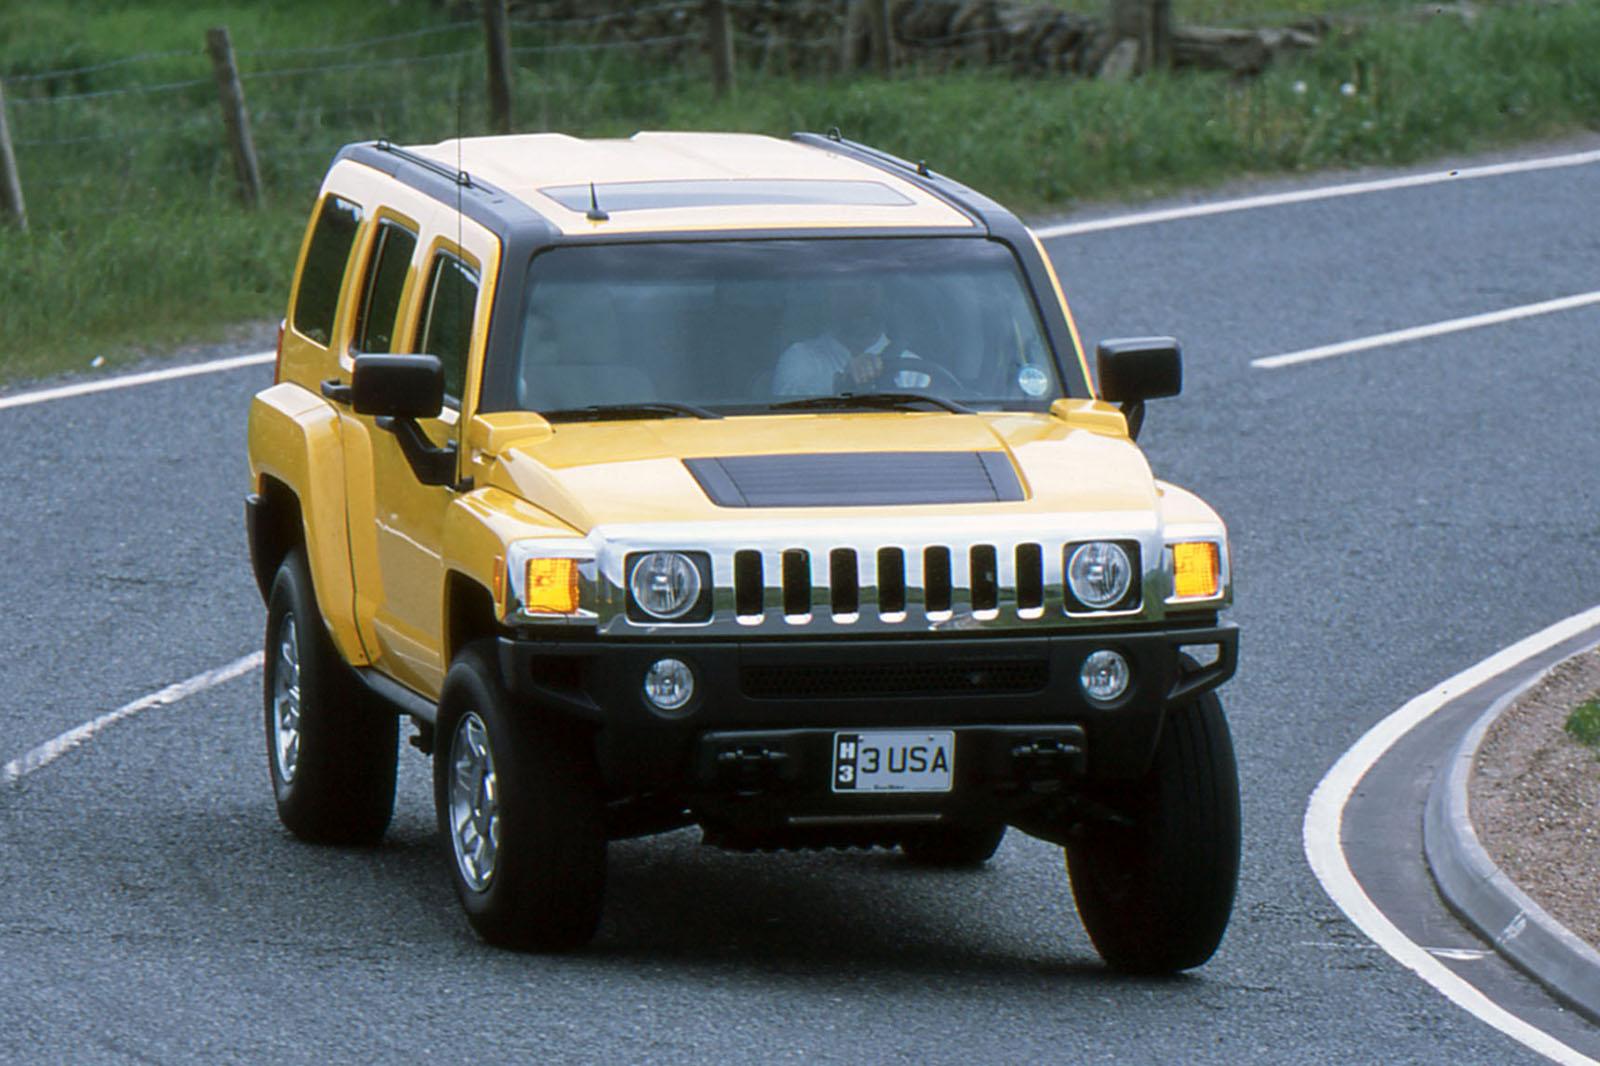 Used car buying guide: Hummer H11/H11 | Autocar | buy hummer uk